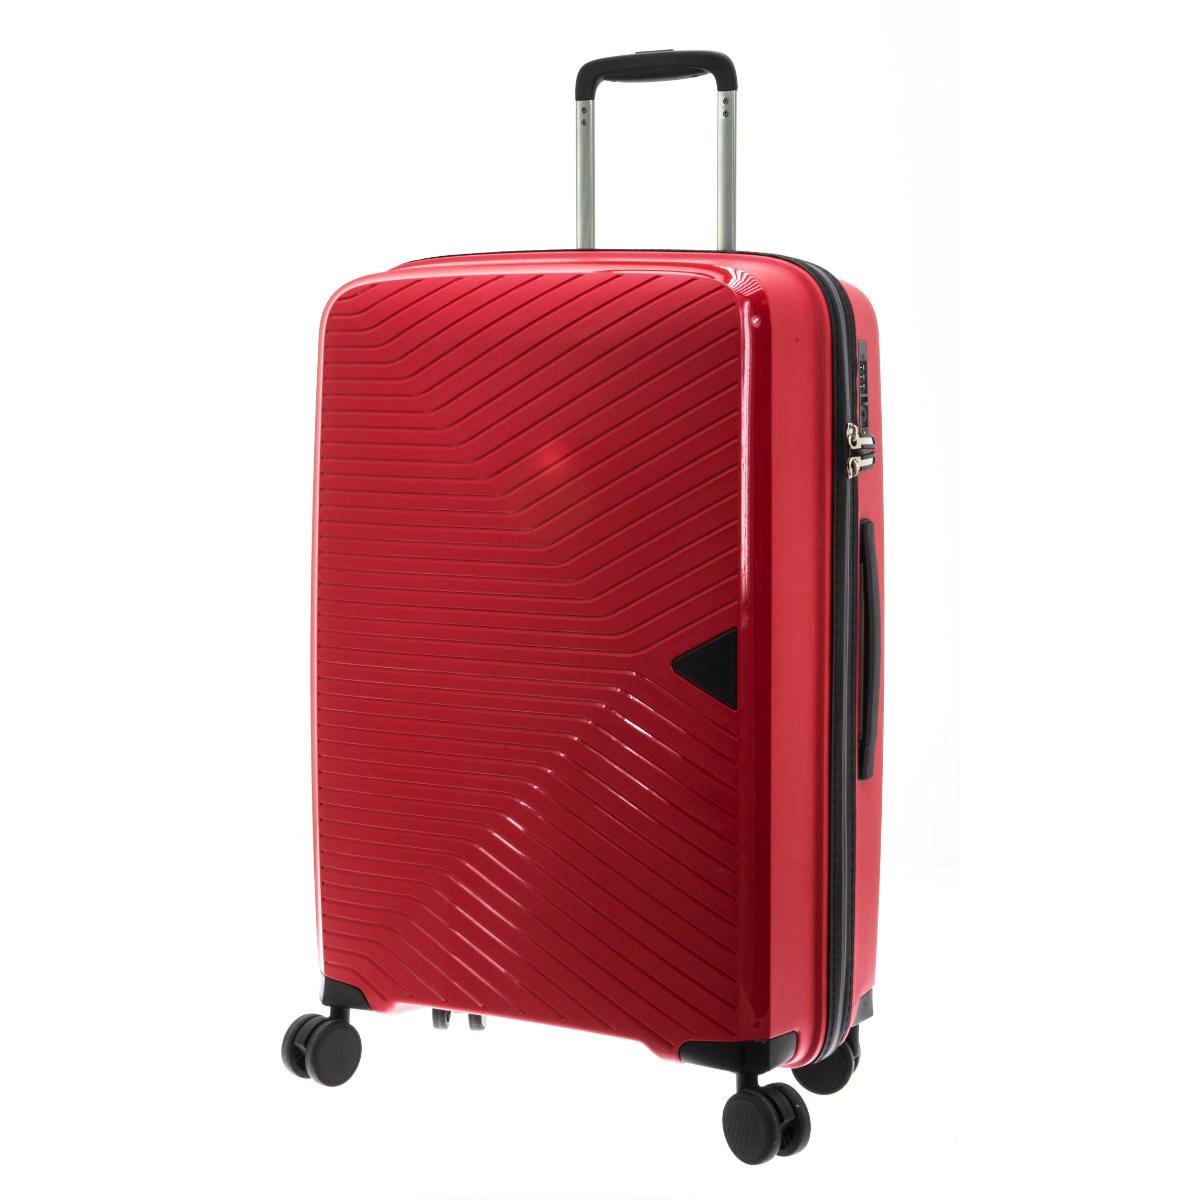 Valise trolley coque polypropylène \'Davidt\'s\' rouge - 67x45x25 cm - [Q9475]